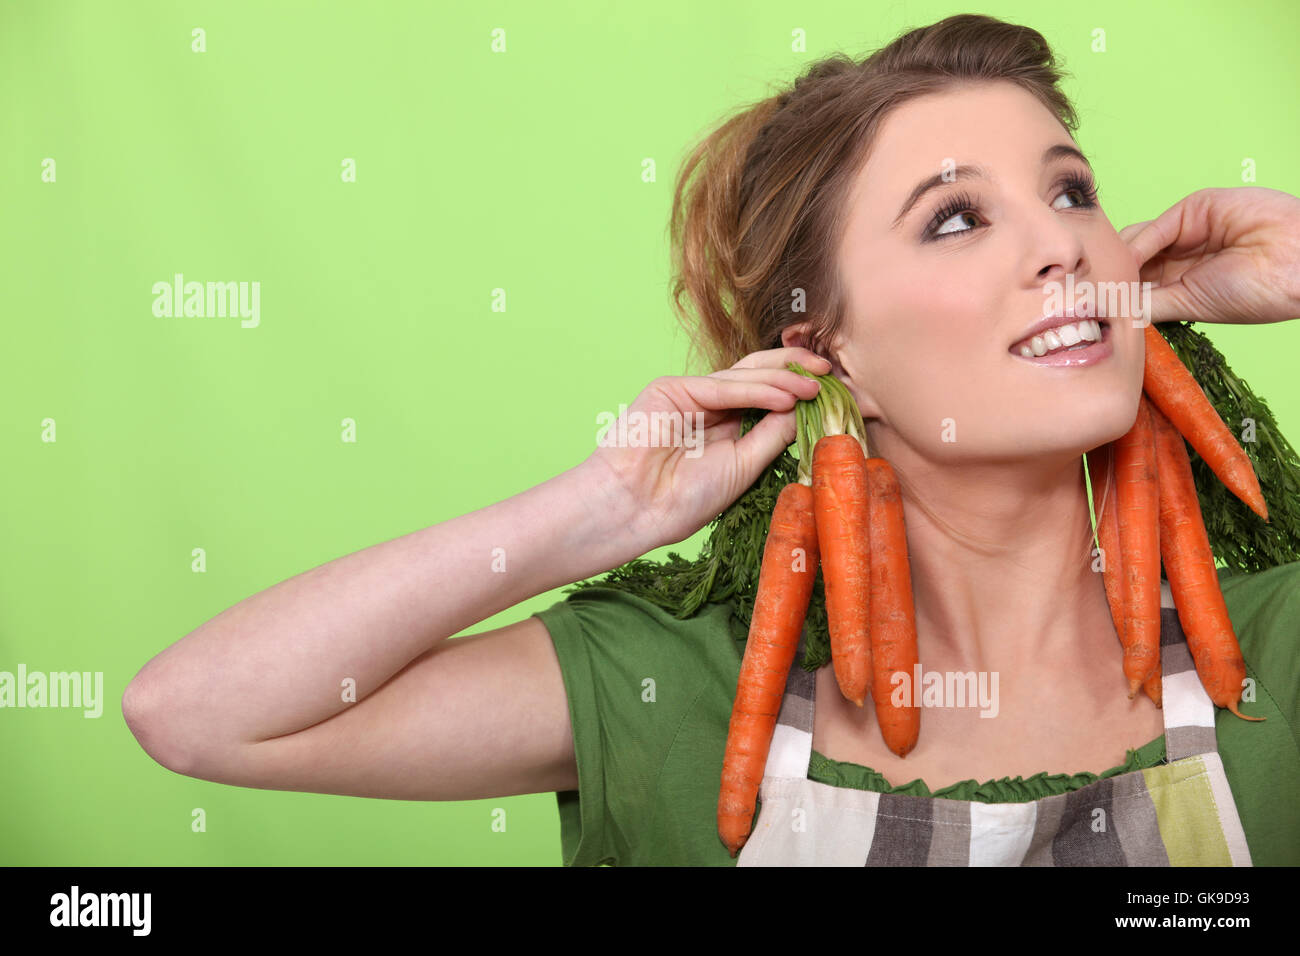 absurd bizarre carrots - Stock Image